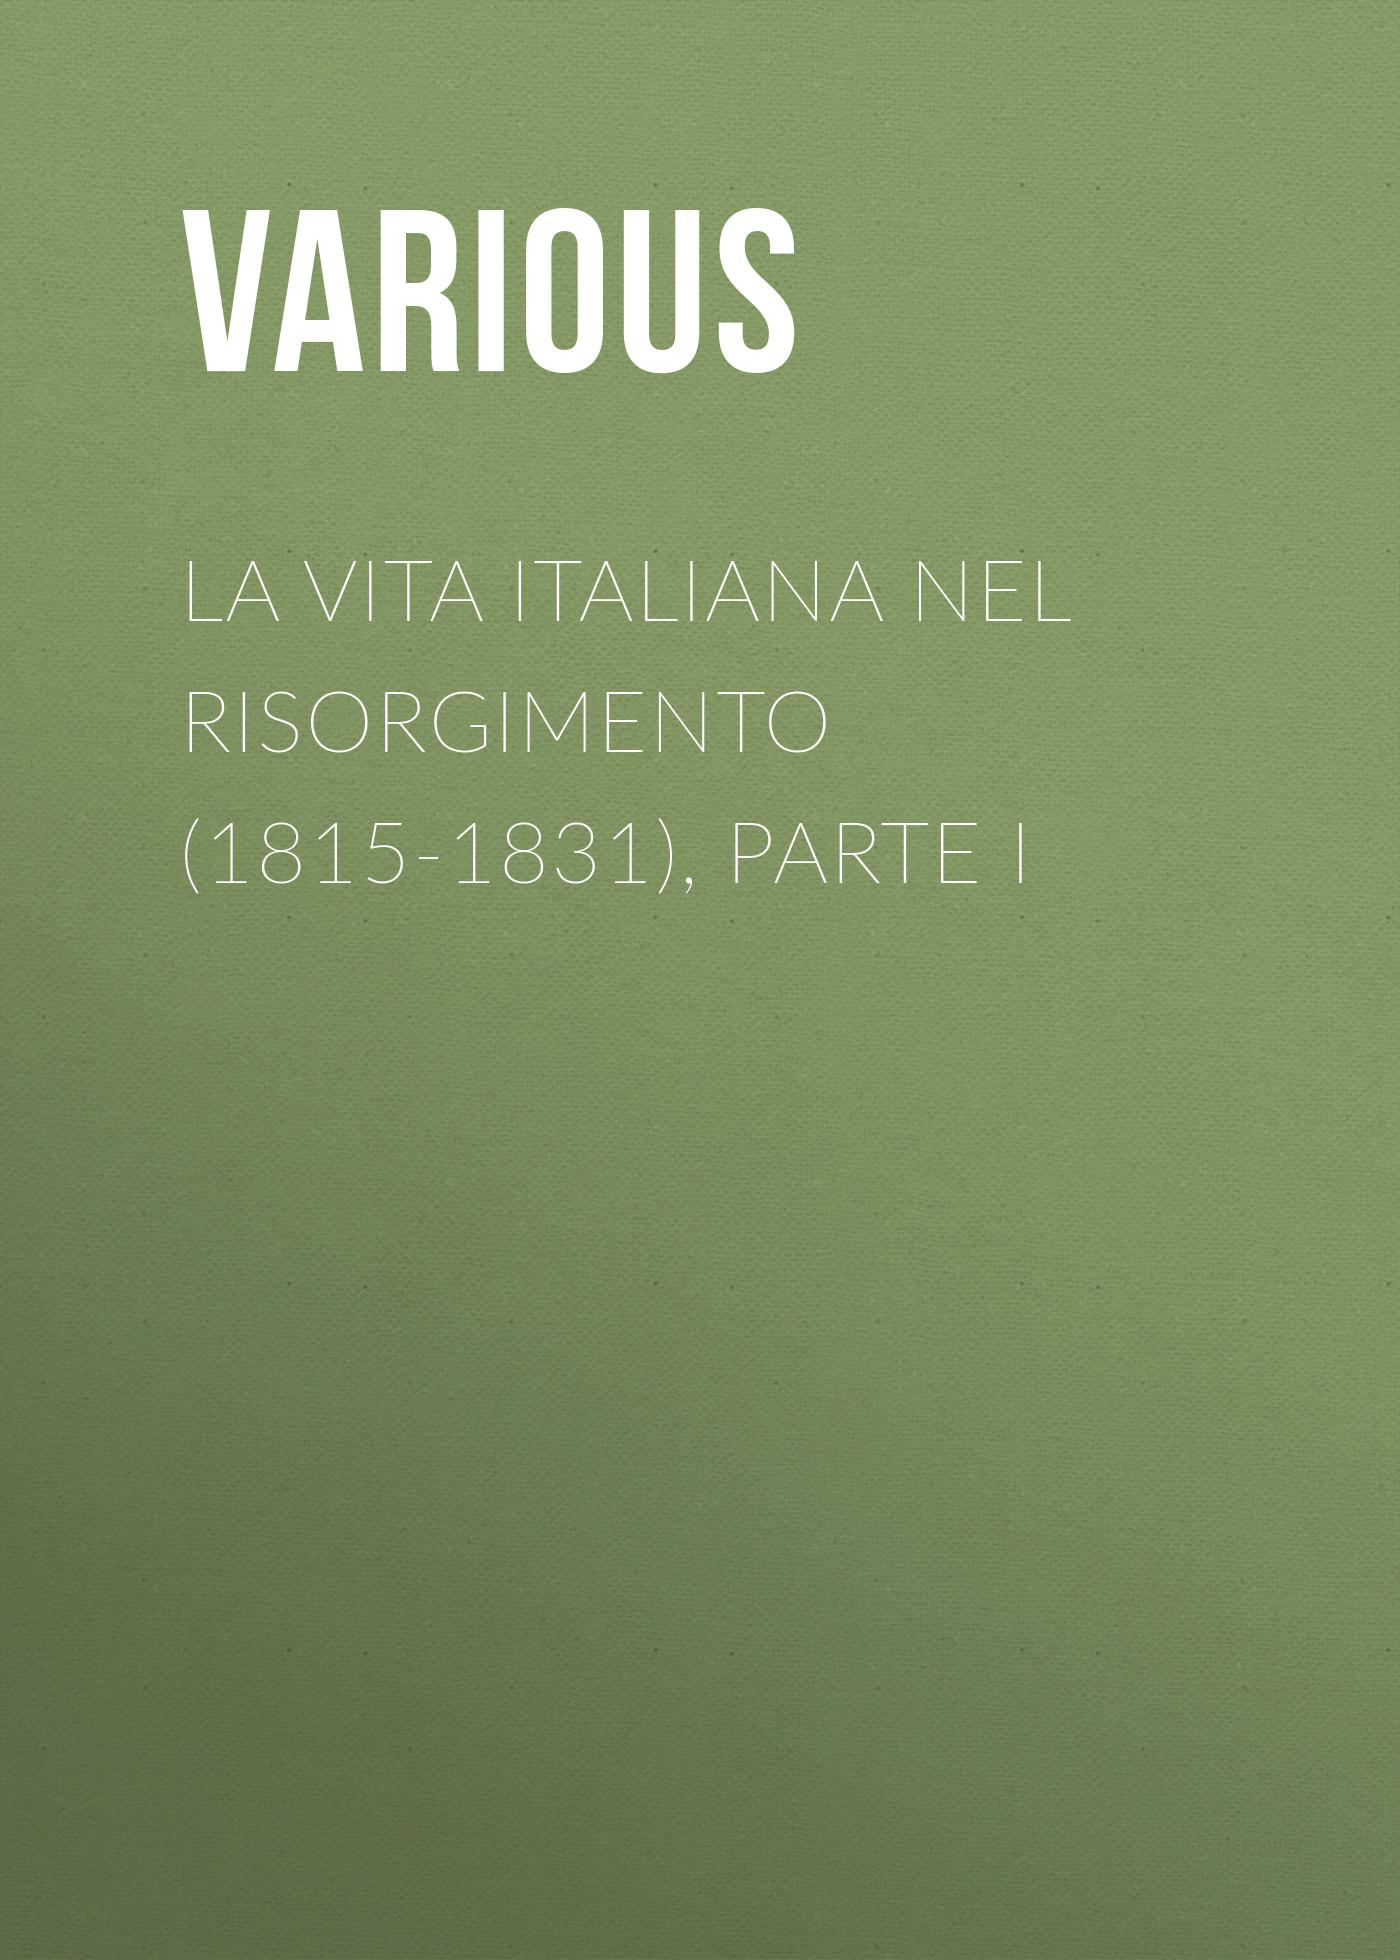 Various La vita Italiana nel Risorgimento (1815-1831), parte I bersezio vittorio la plebe parte i